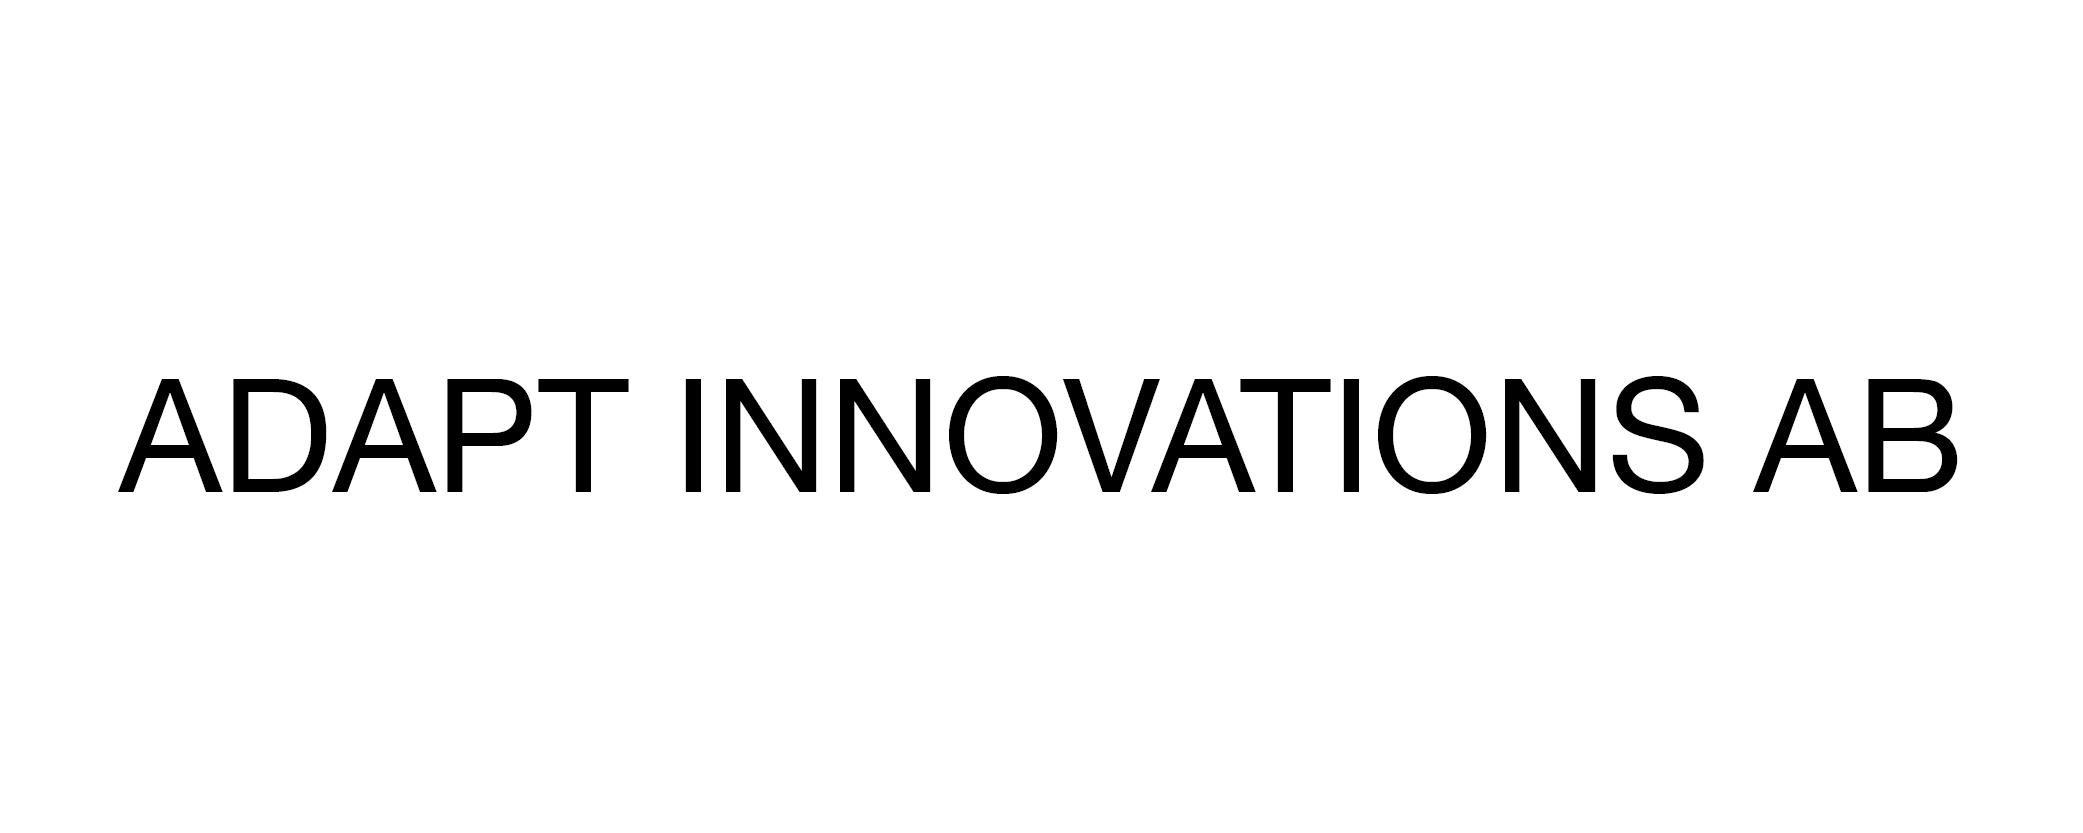 Adapt Innovations AB